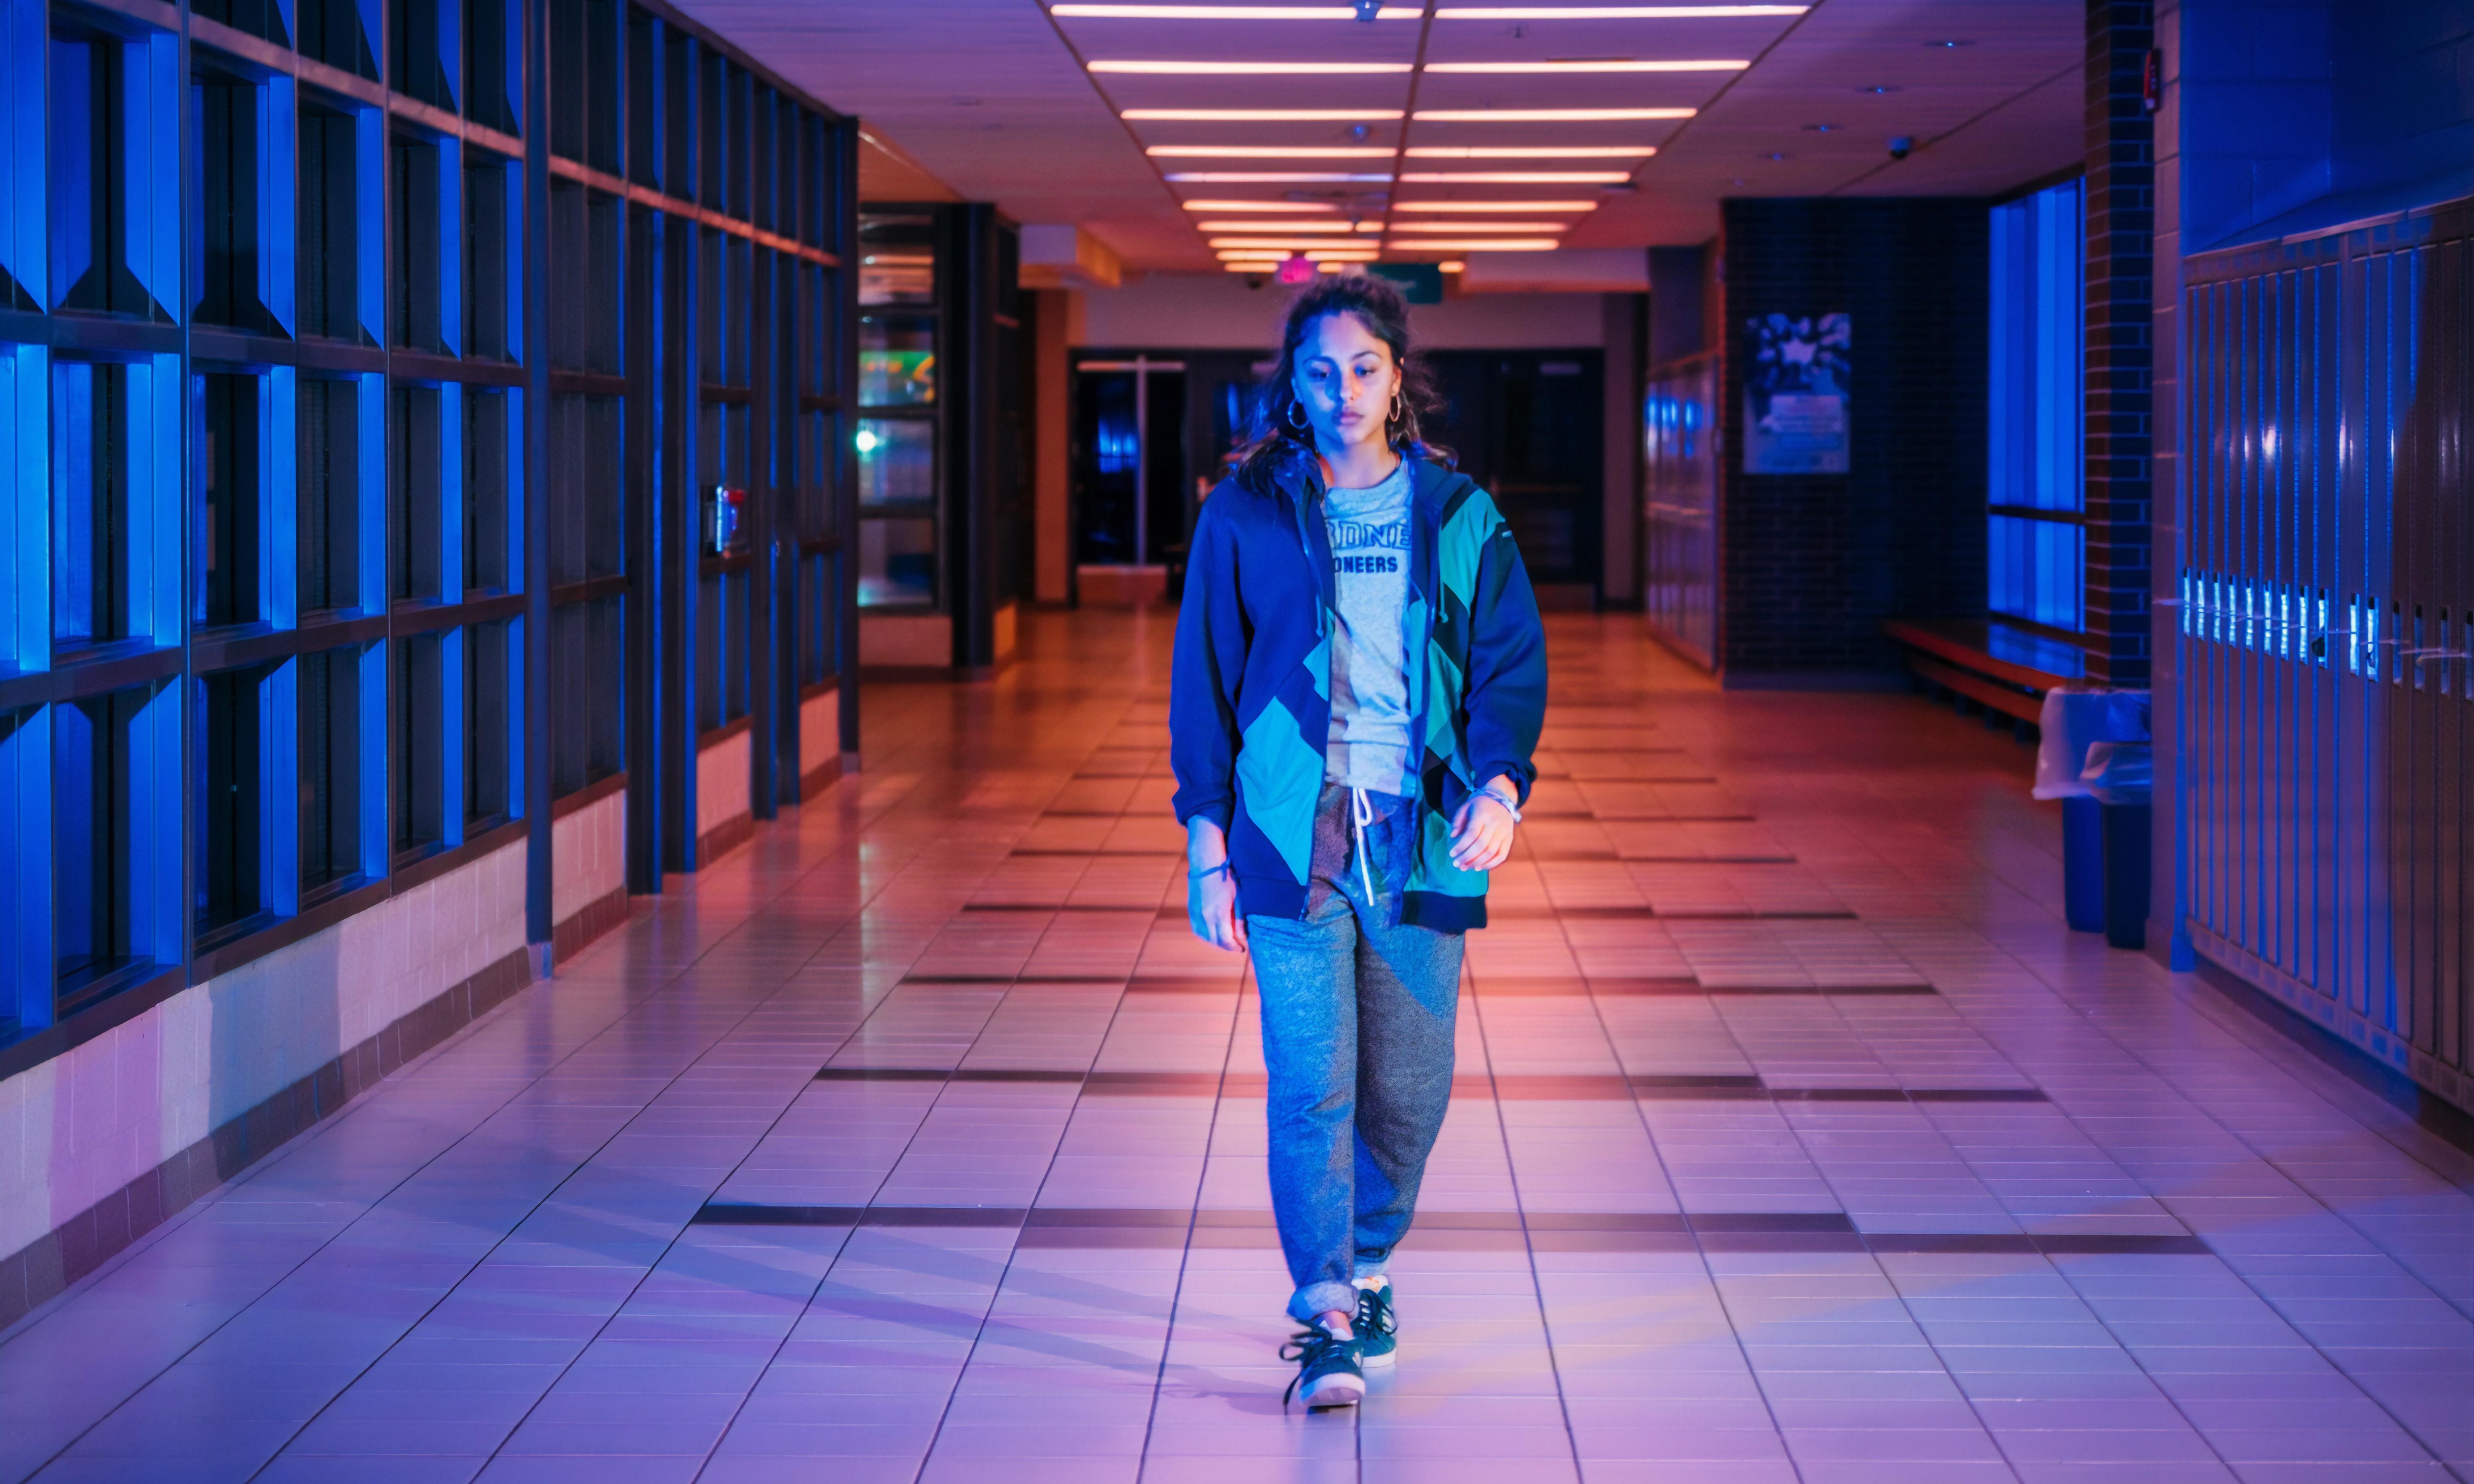 Share review – sobering, sensitive drama focuses on high-school rape